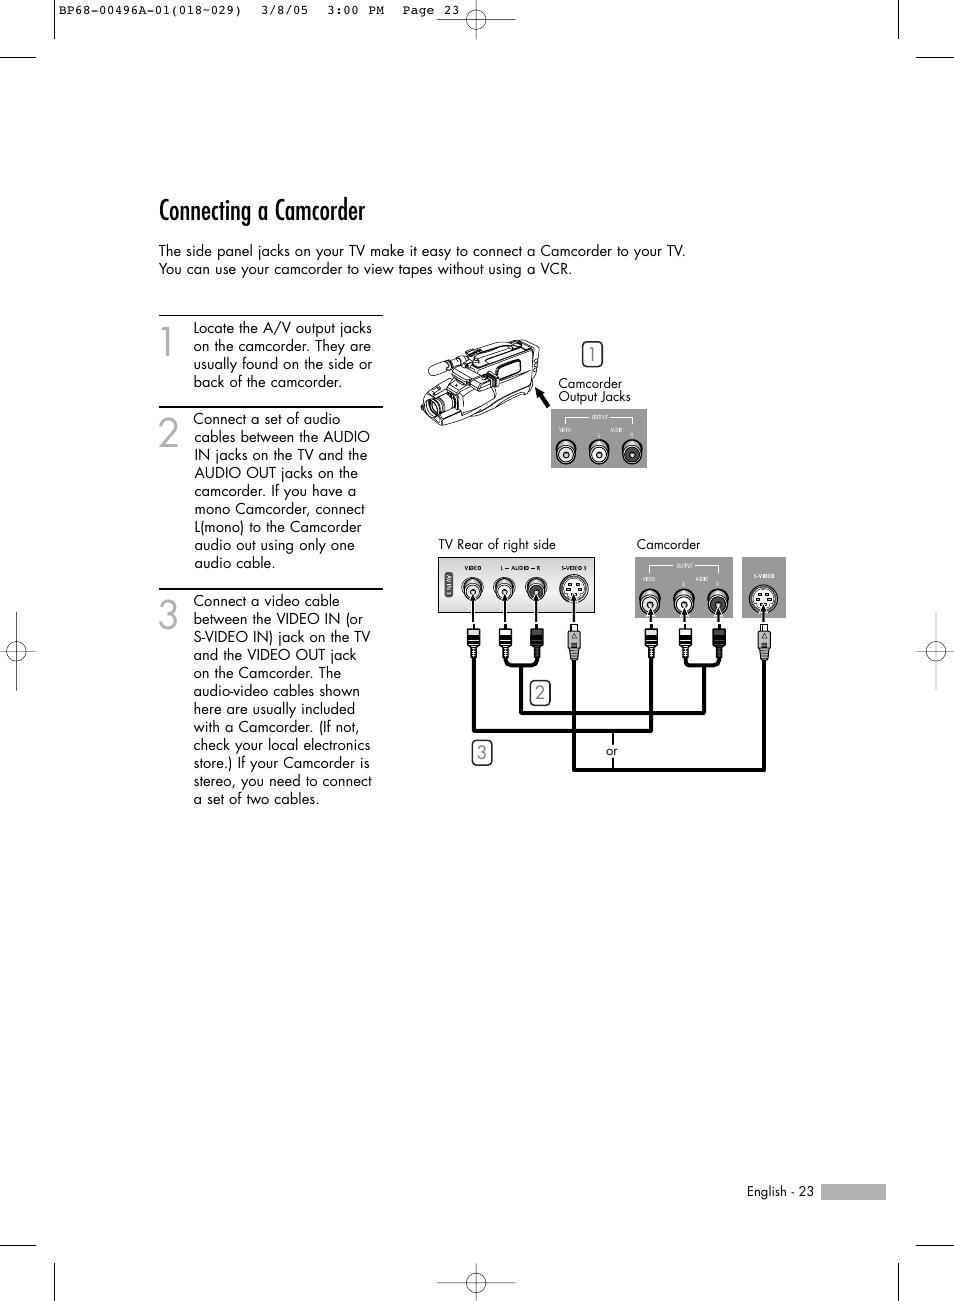 connecting a camcorder samsung hlr4266wx xaa user manual page 23 rh manualsdir com